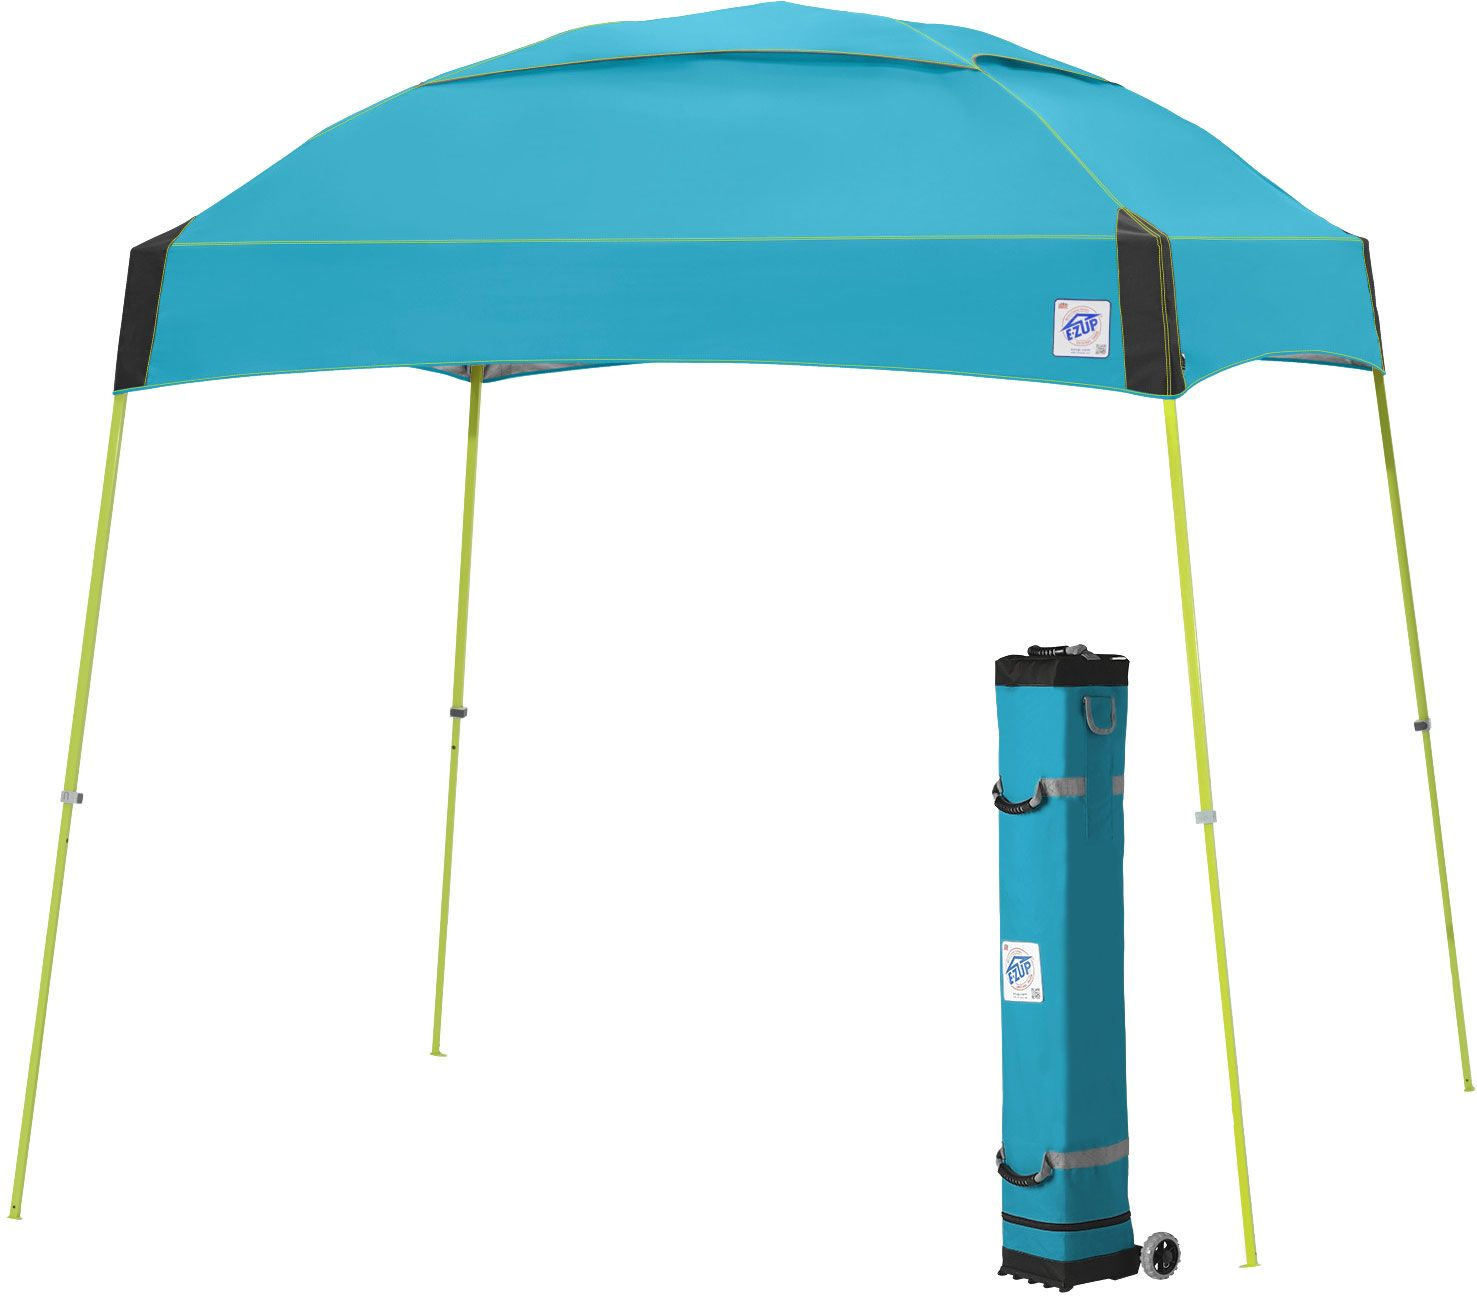 noImageFound ???  sc 1 st  DICKu0027S Sporting Goods & E-Z UP 10u0027 x 10u0027 Dome Instant Canopy | DICKu0027S Sporting Goods